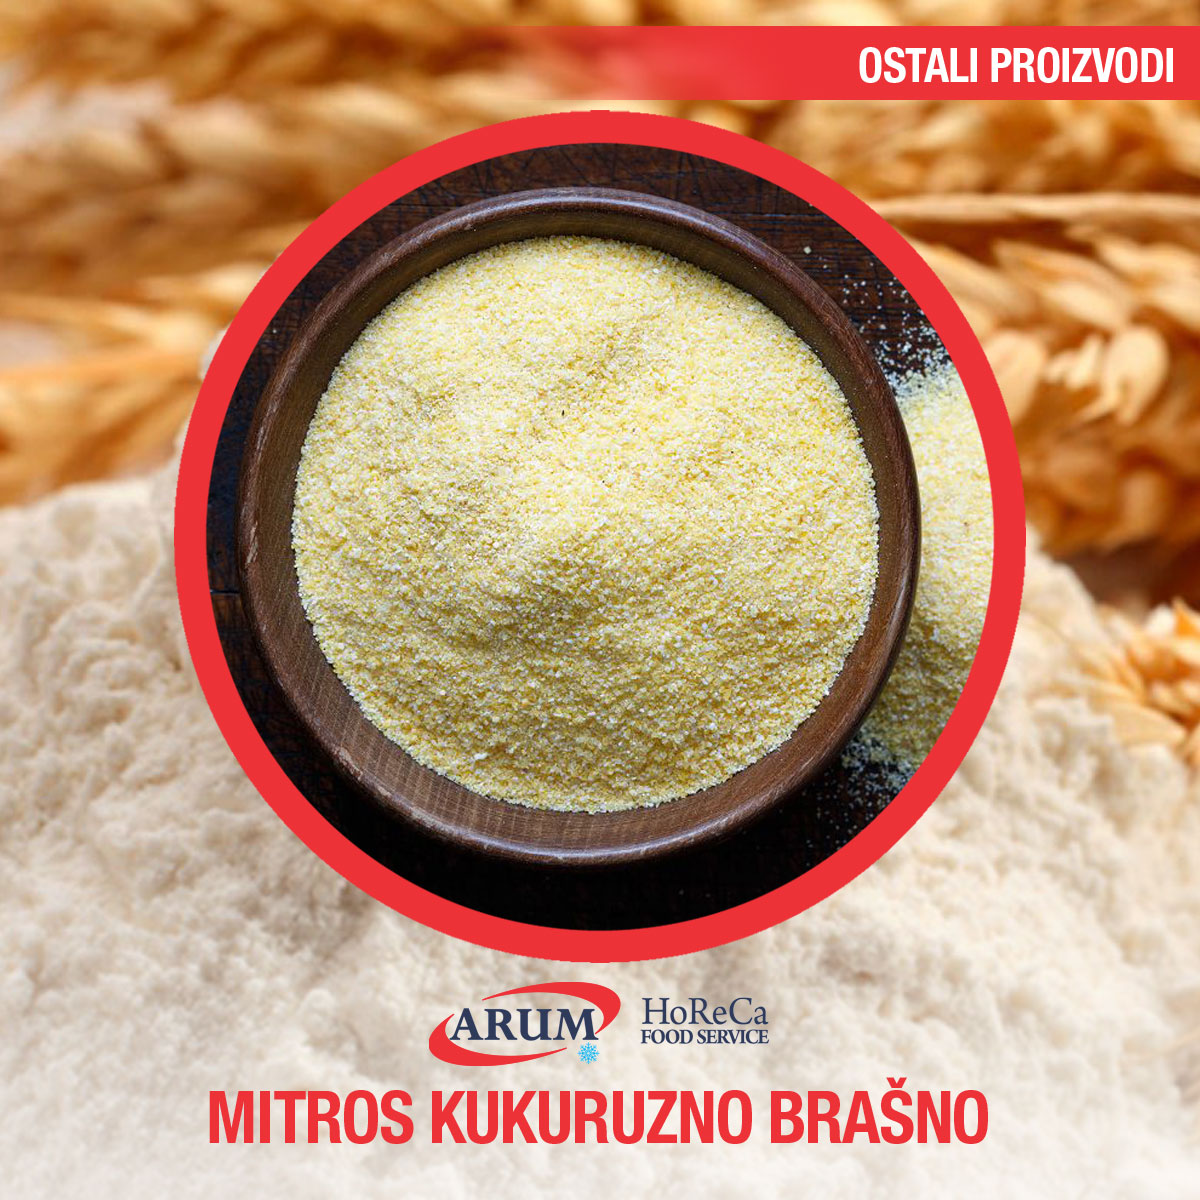 Mitros kukuruzno brasno 500g (30/1#)